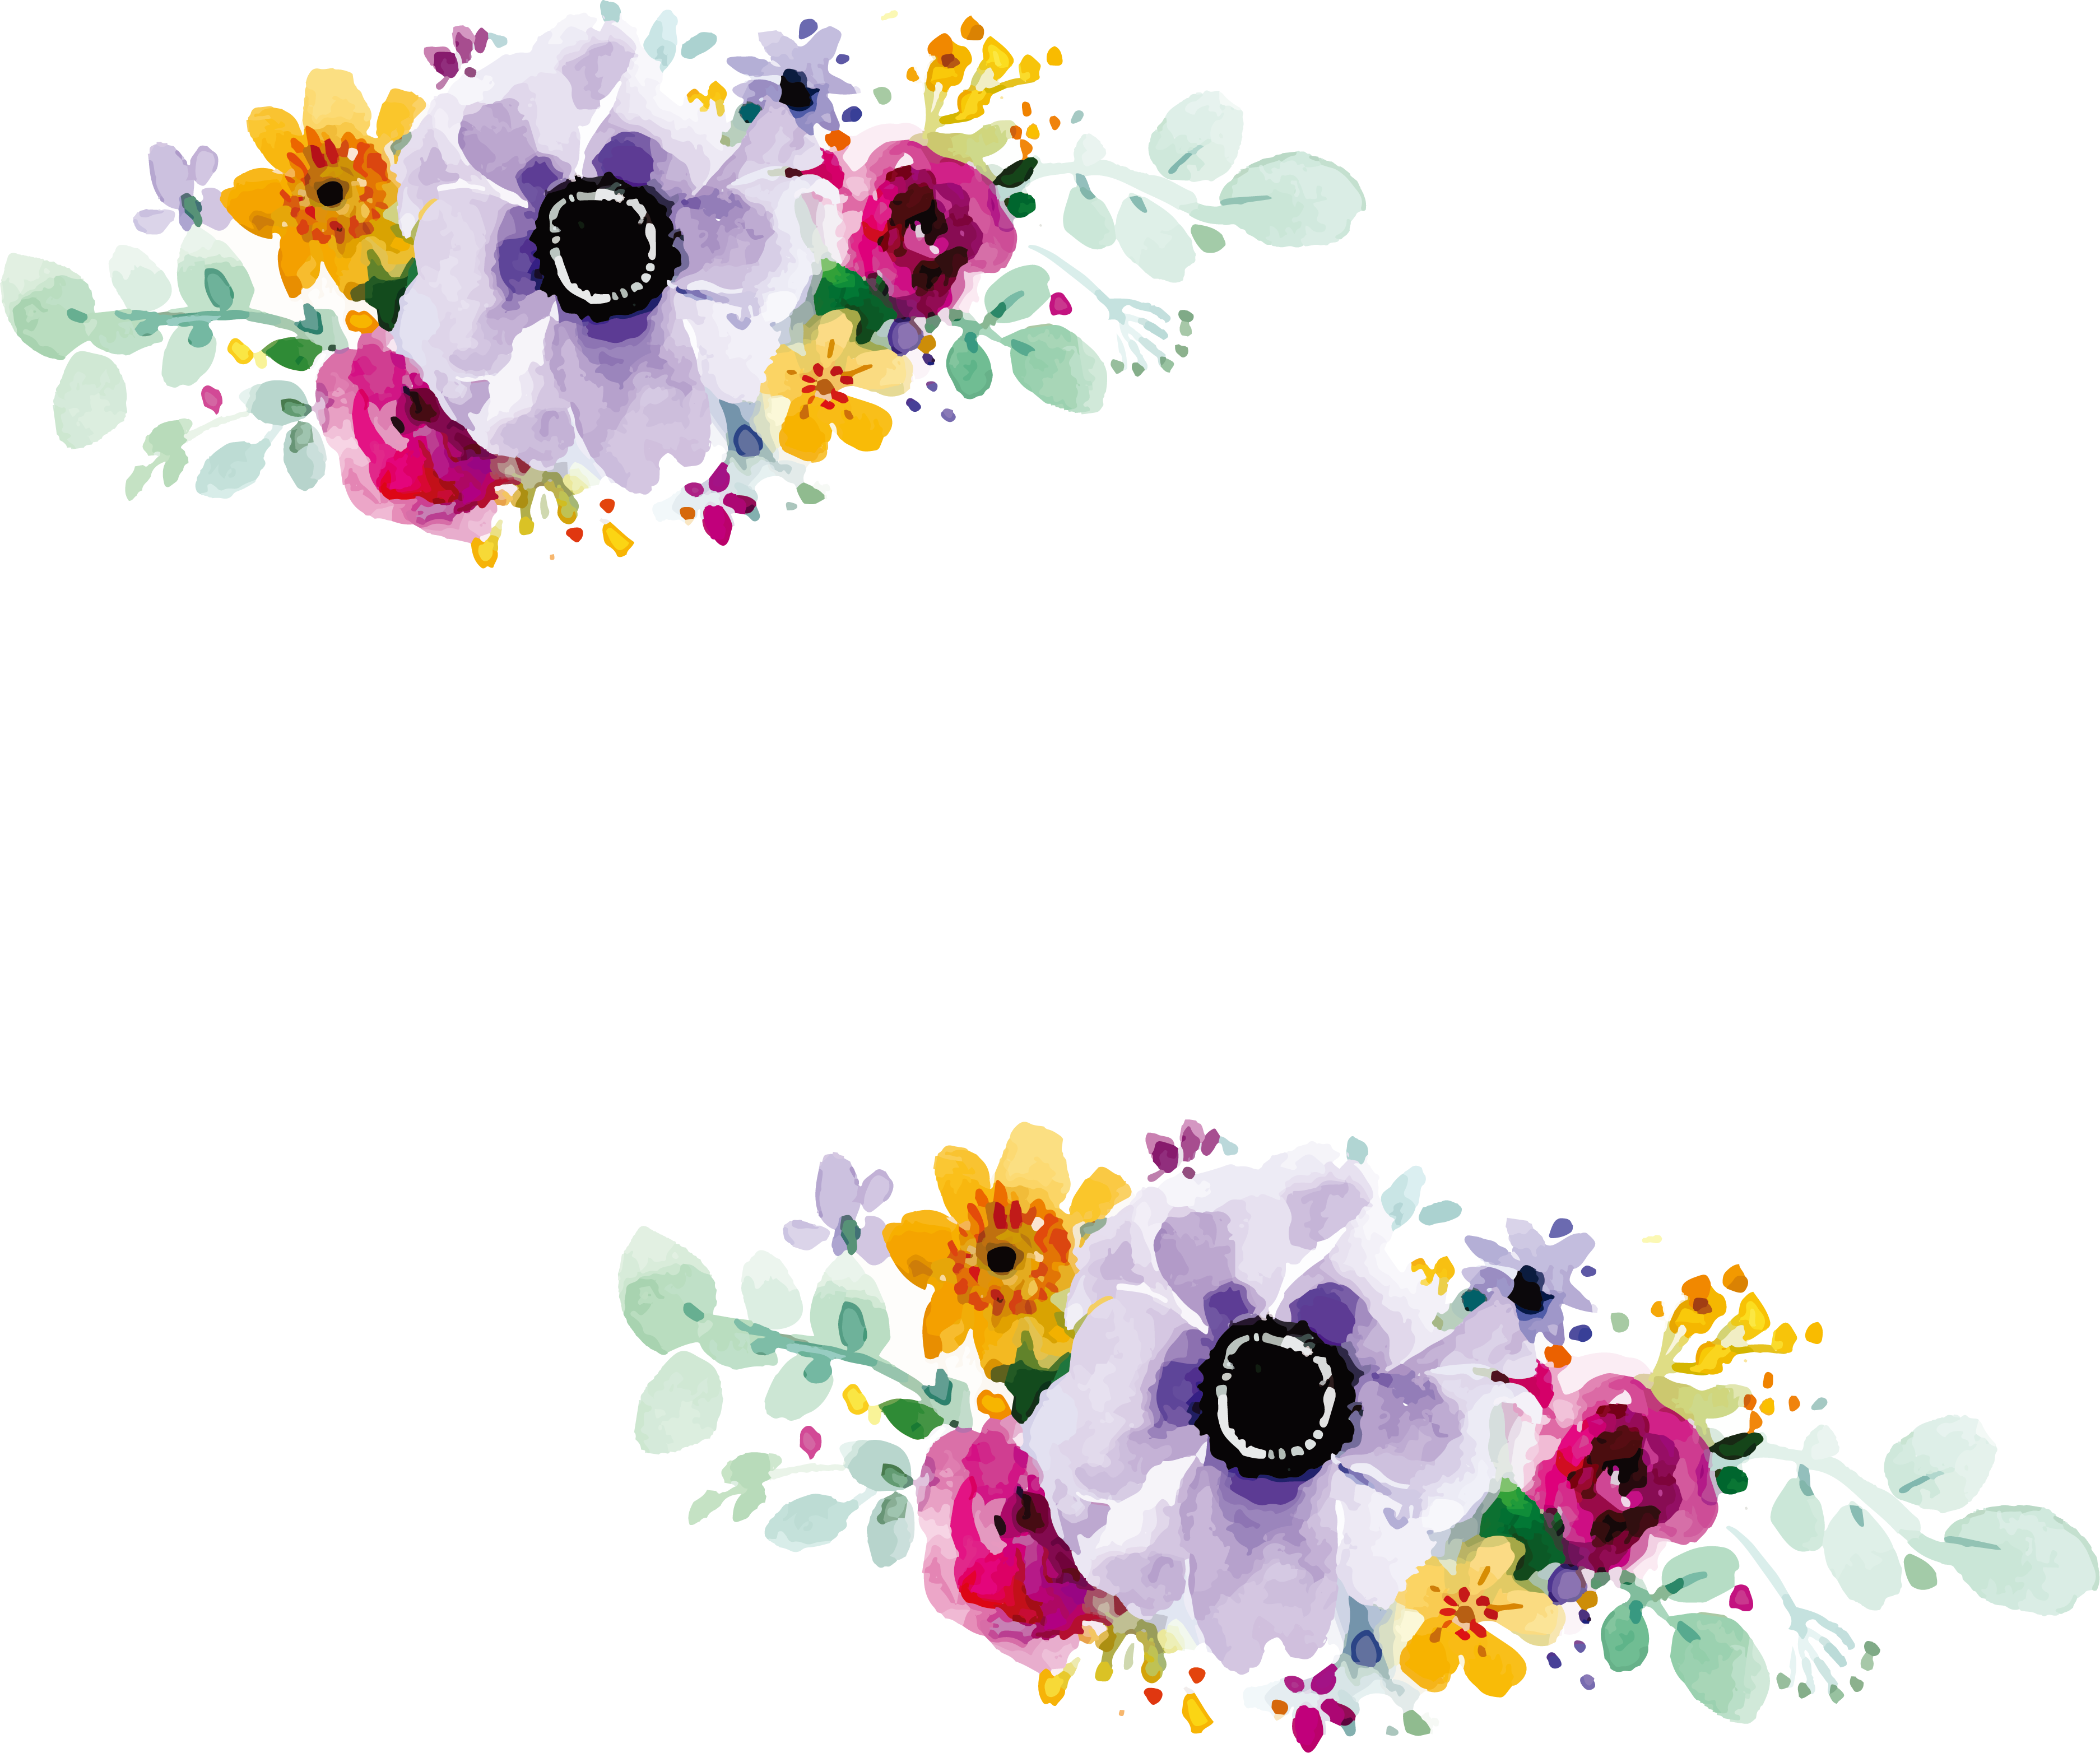 Floral wedding invitation watercolour. Flower design png